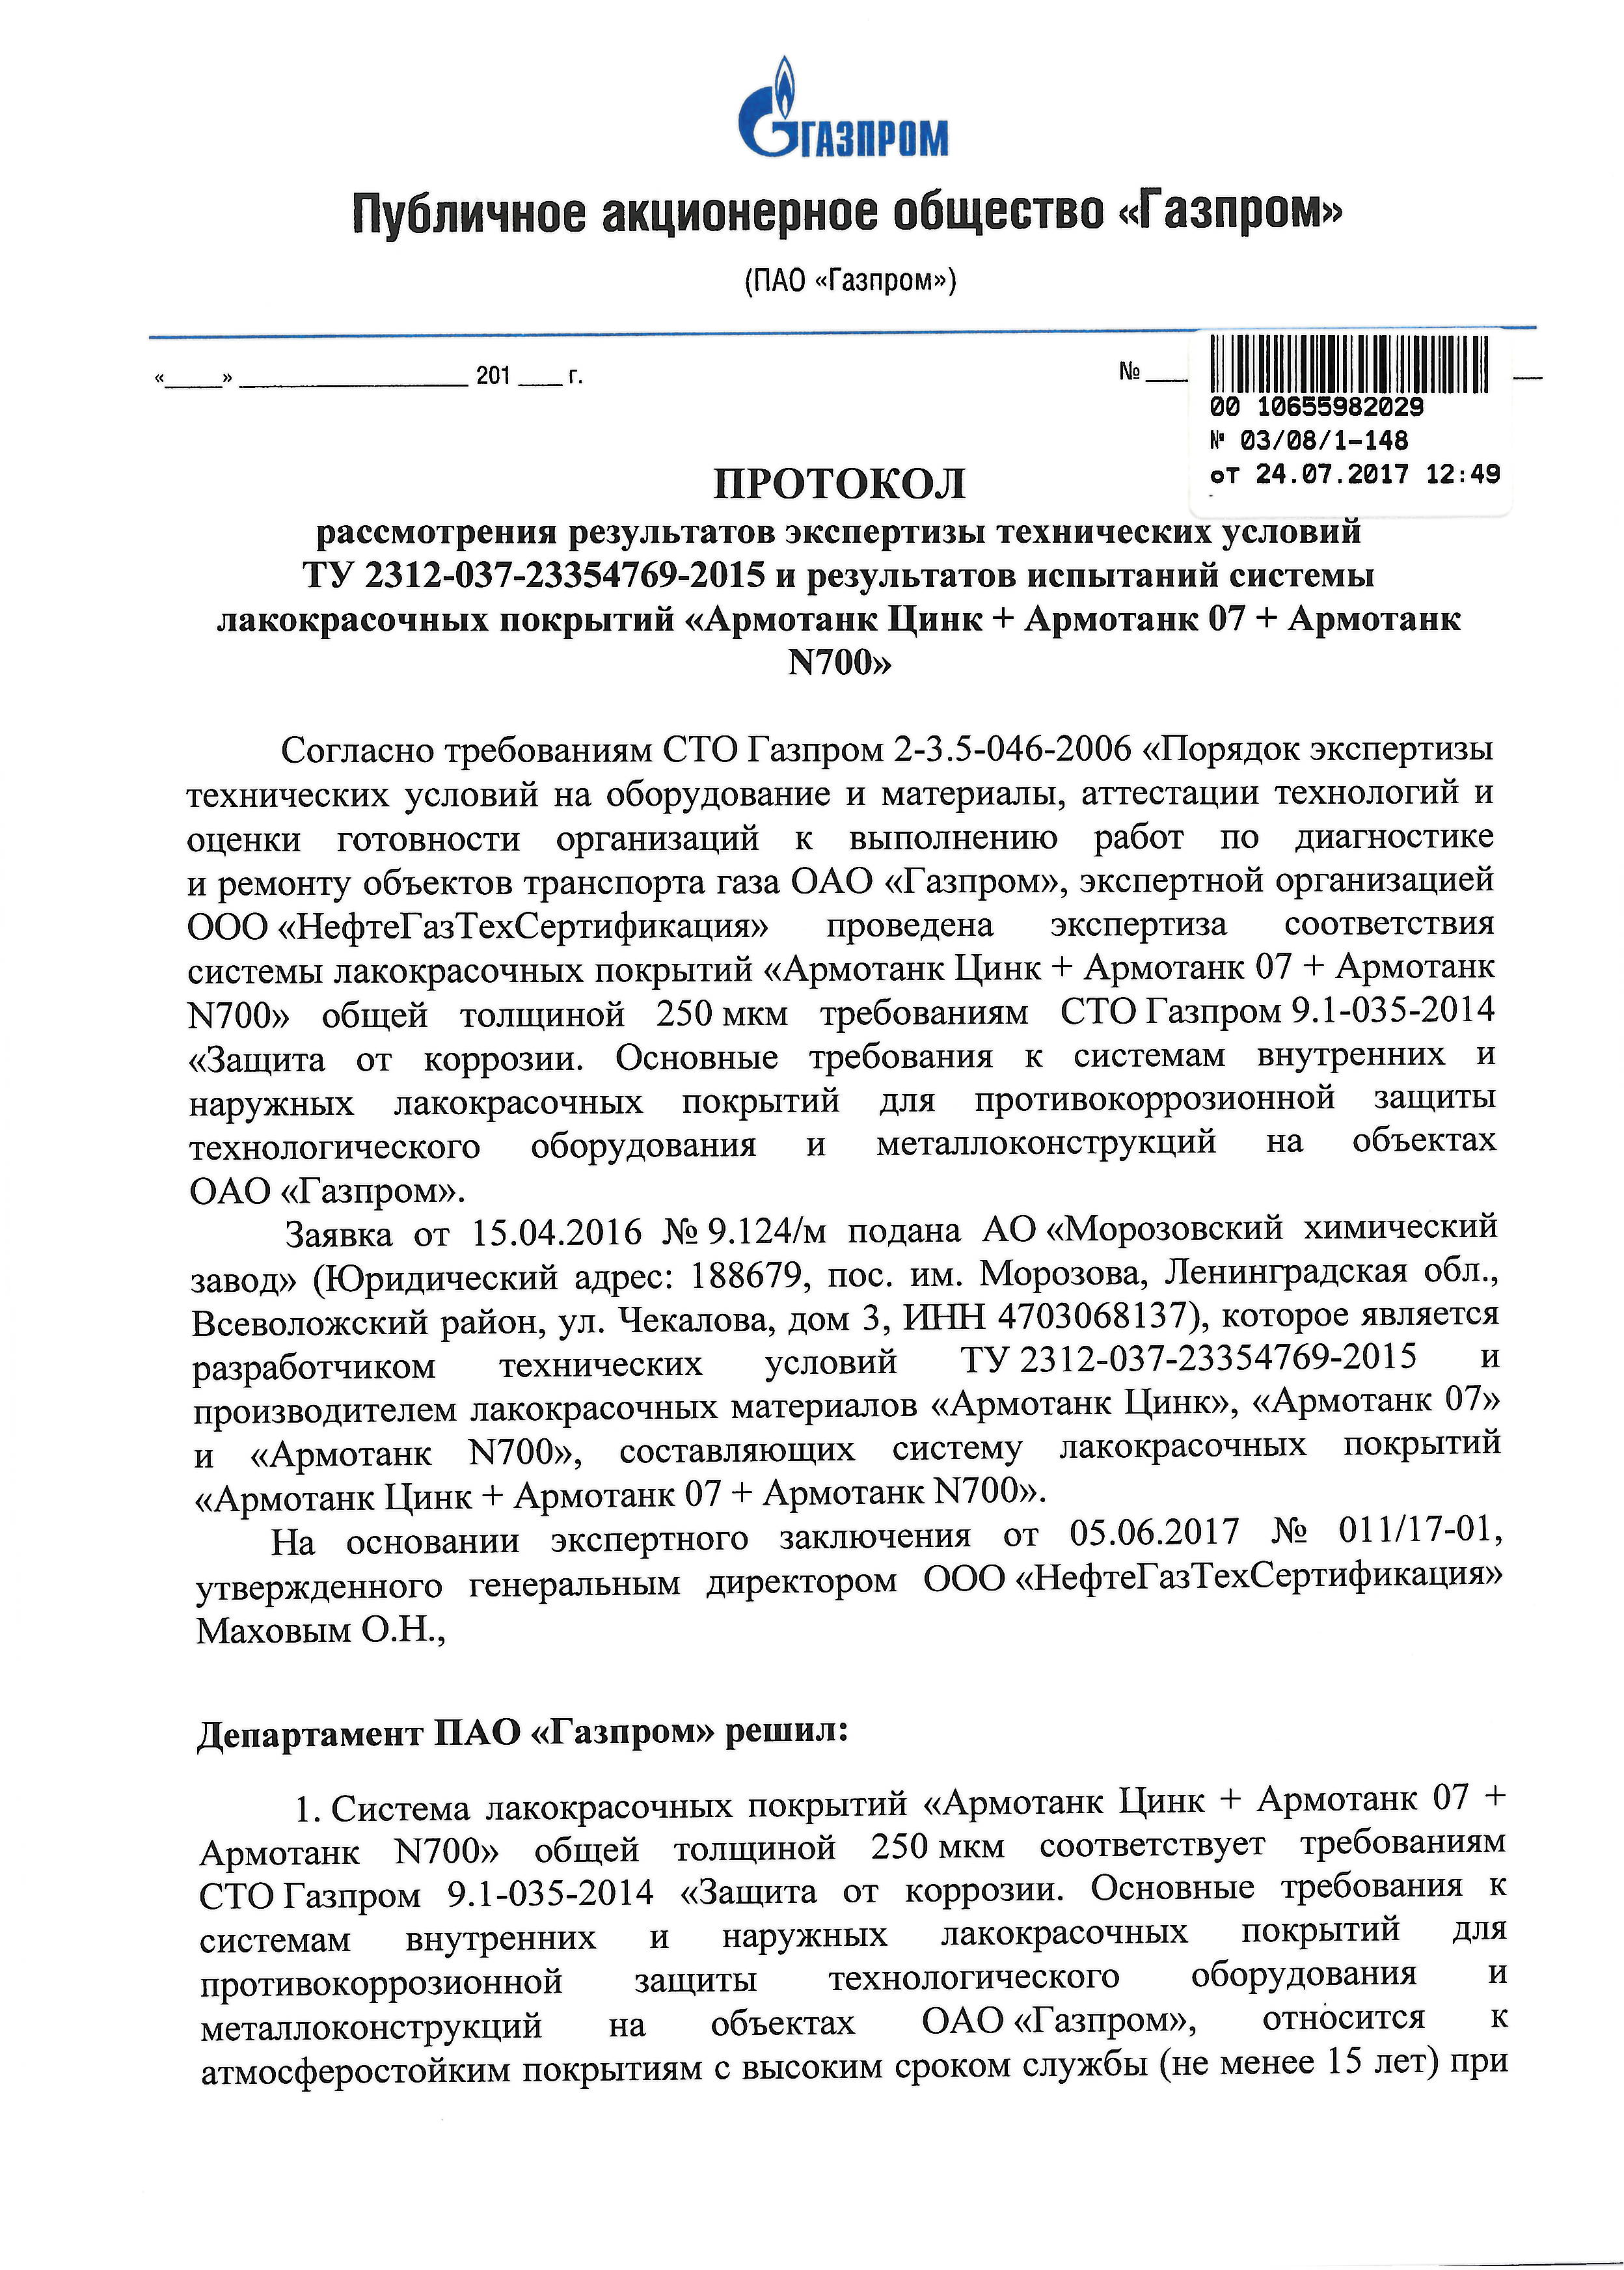 Газпром Армотанк Цинк+07+N700_Страница_1